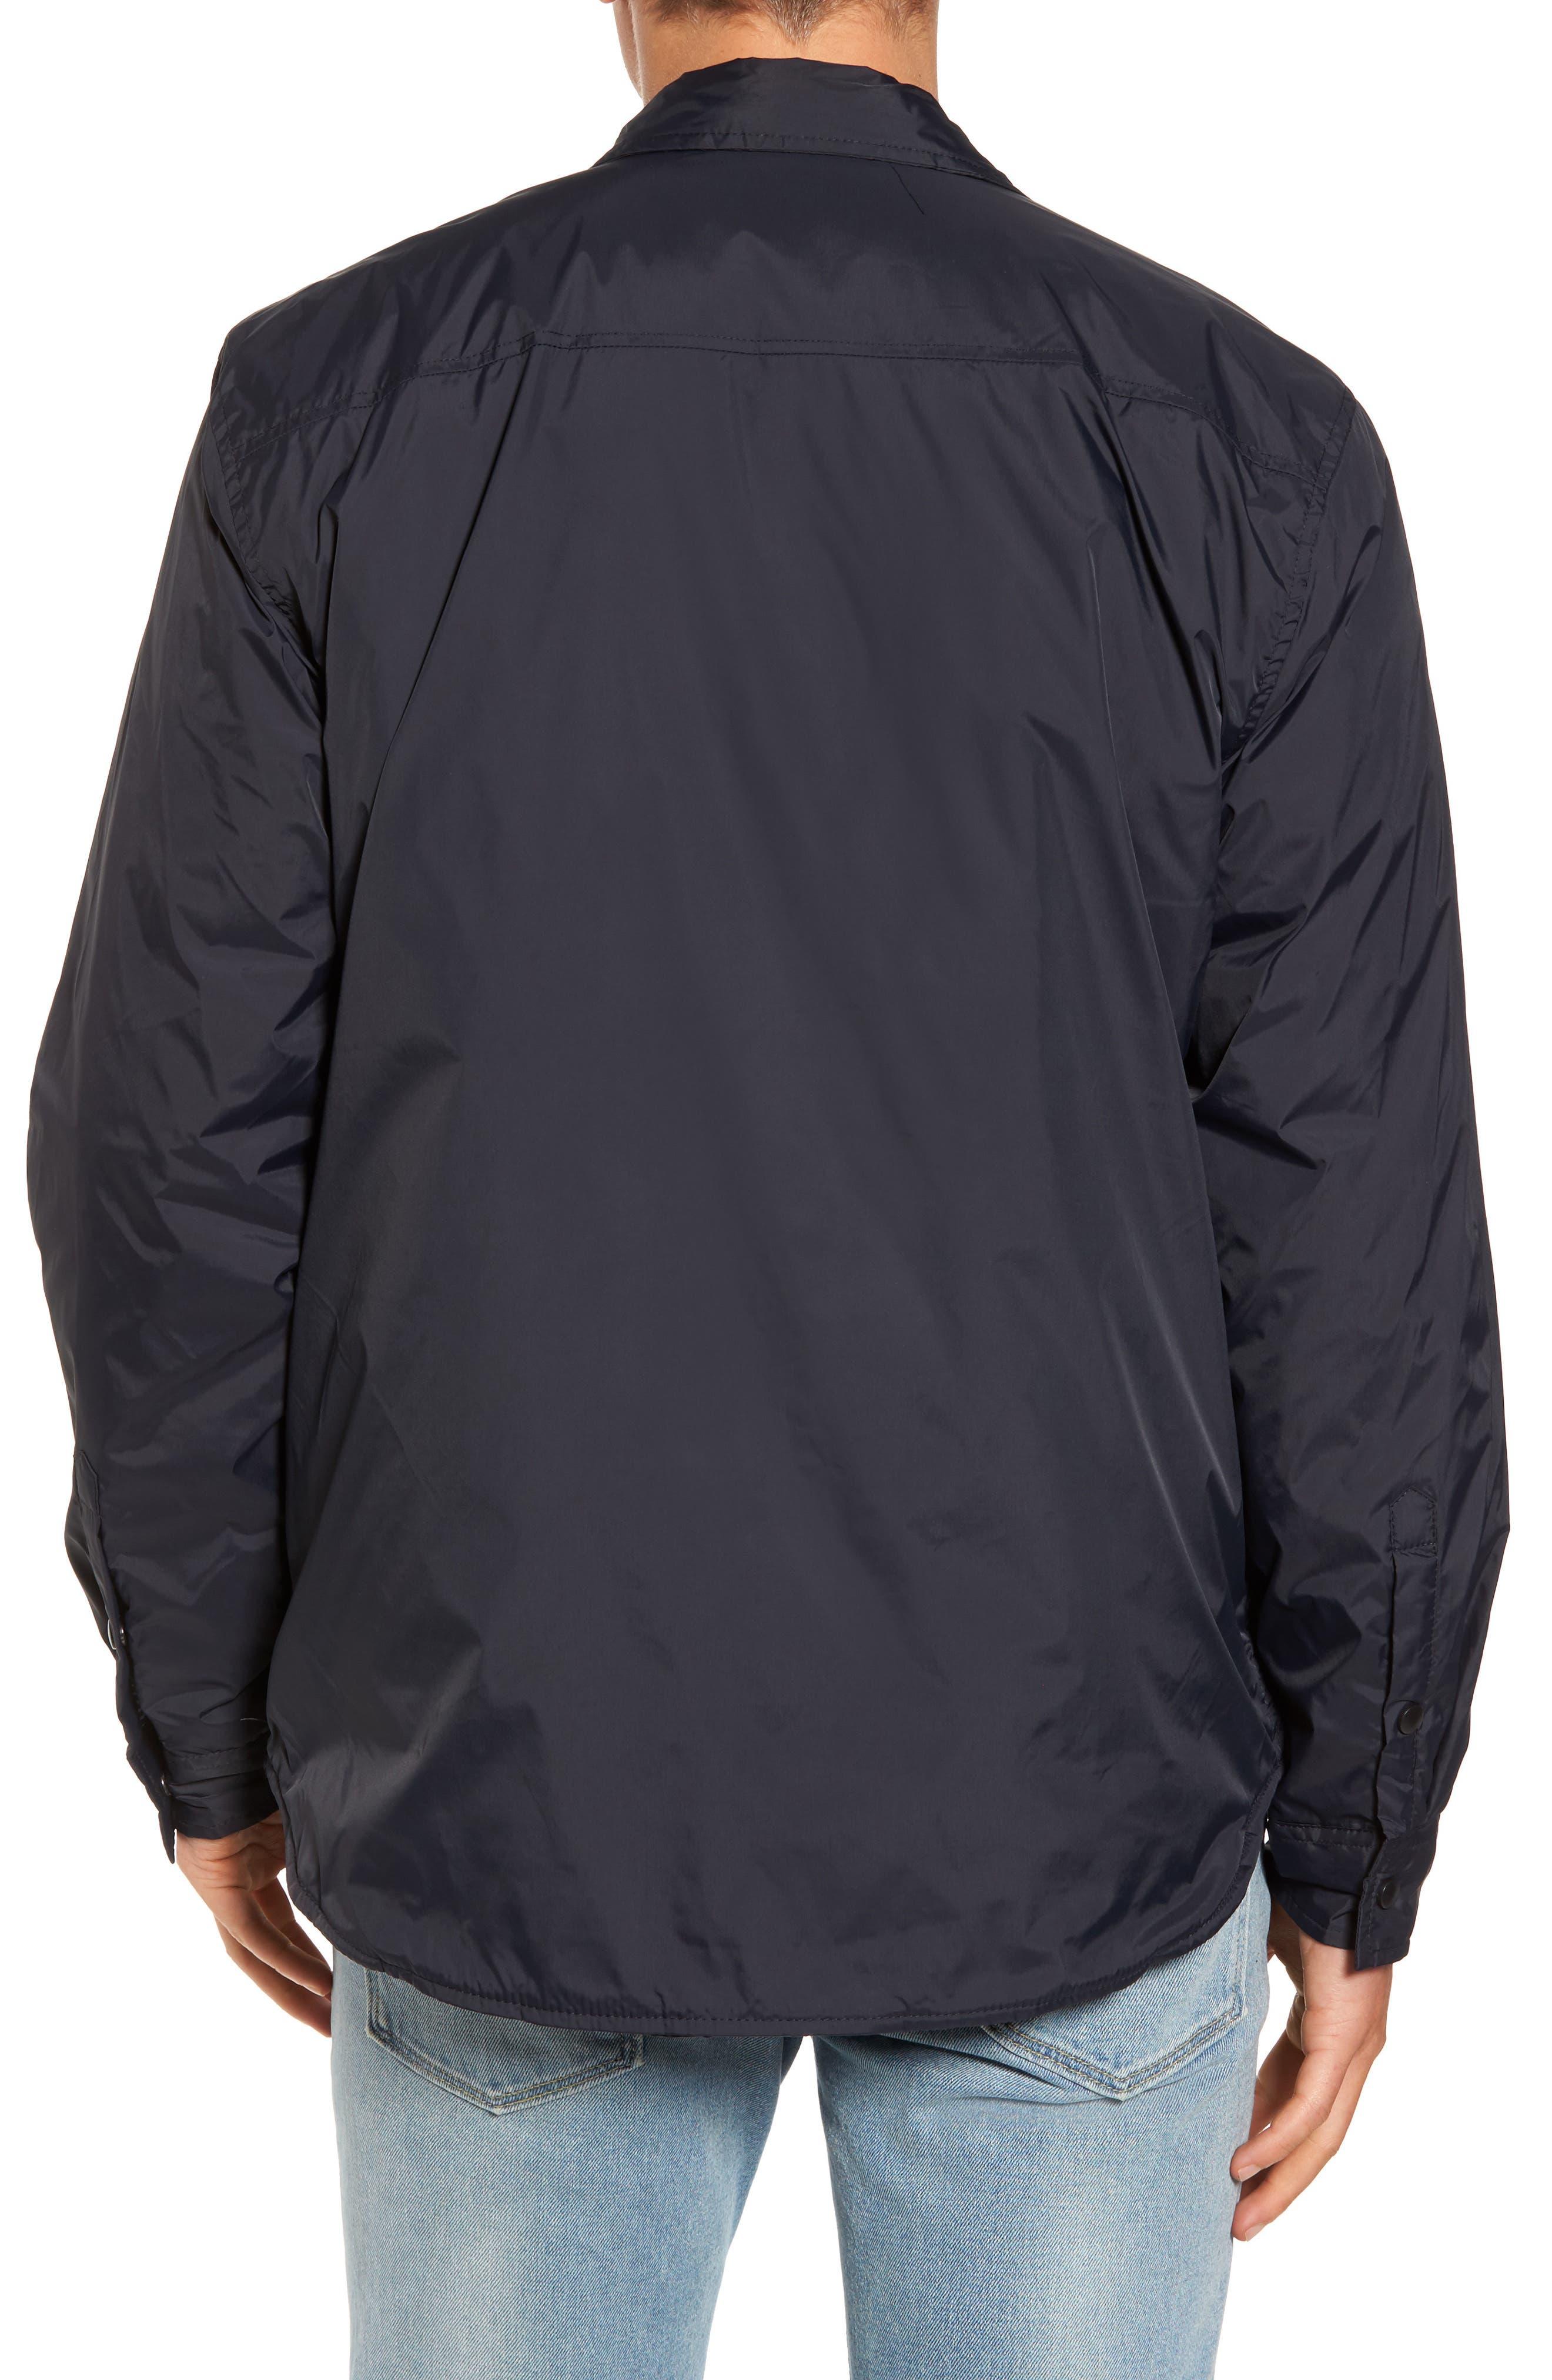 Portland Jacket,                             Alternate thumbnail 4, color,